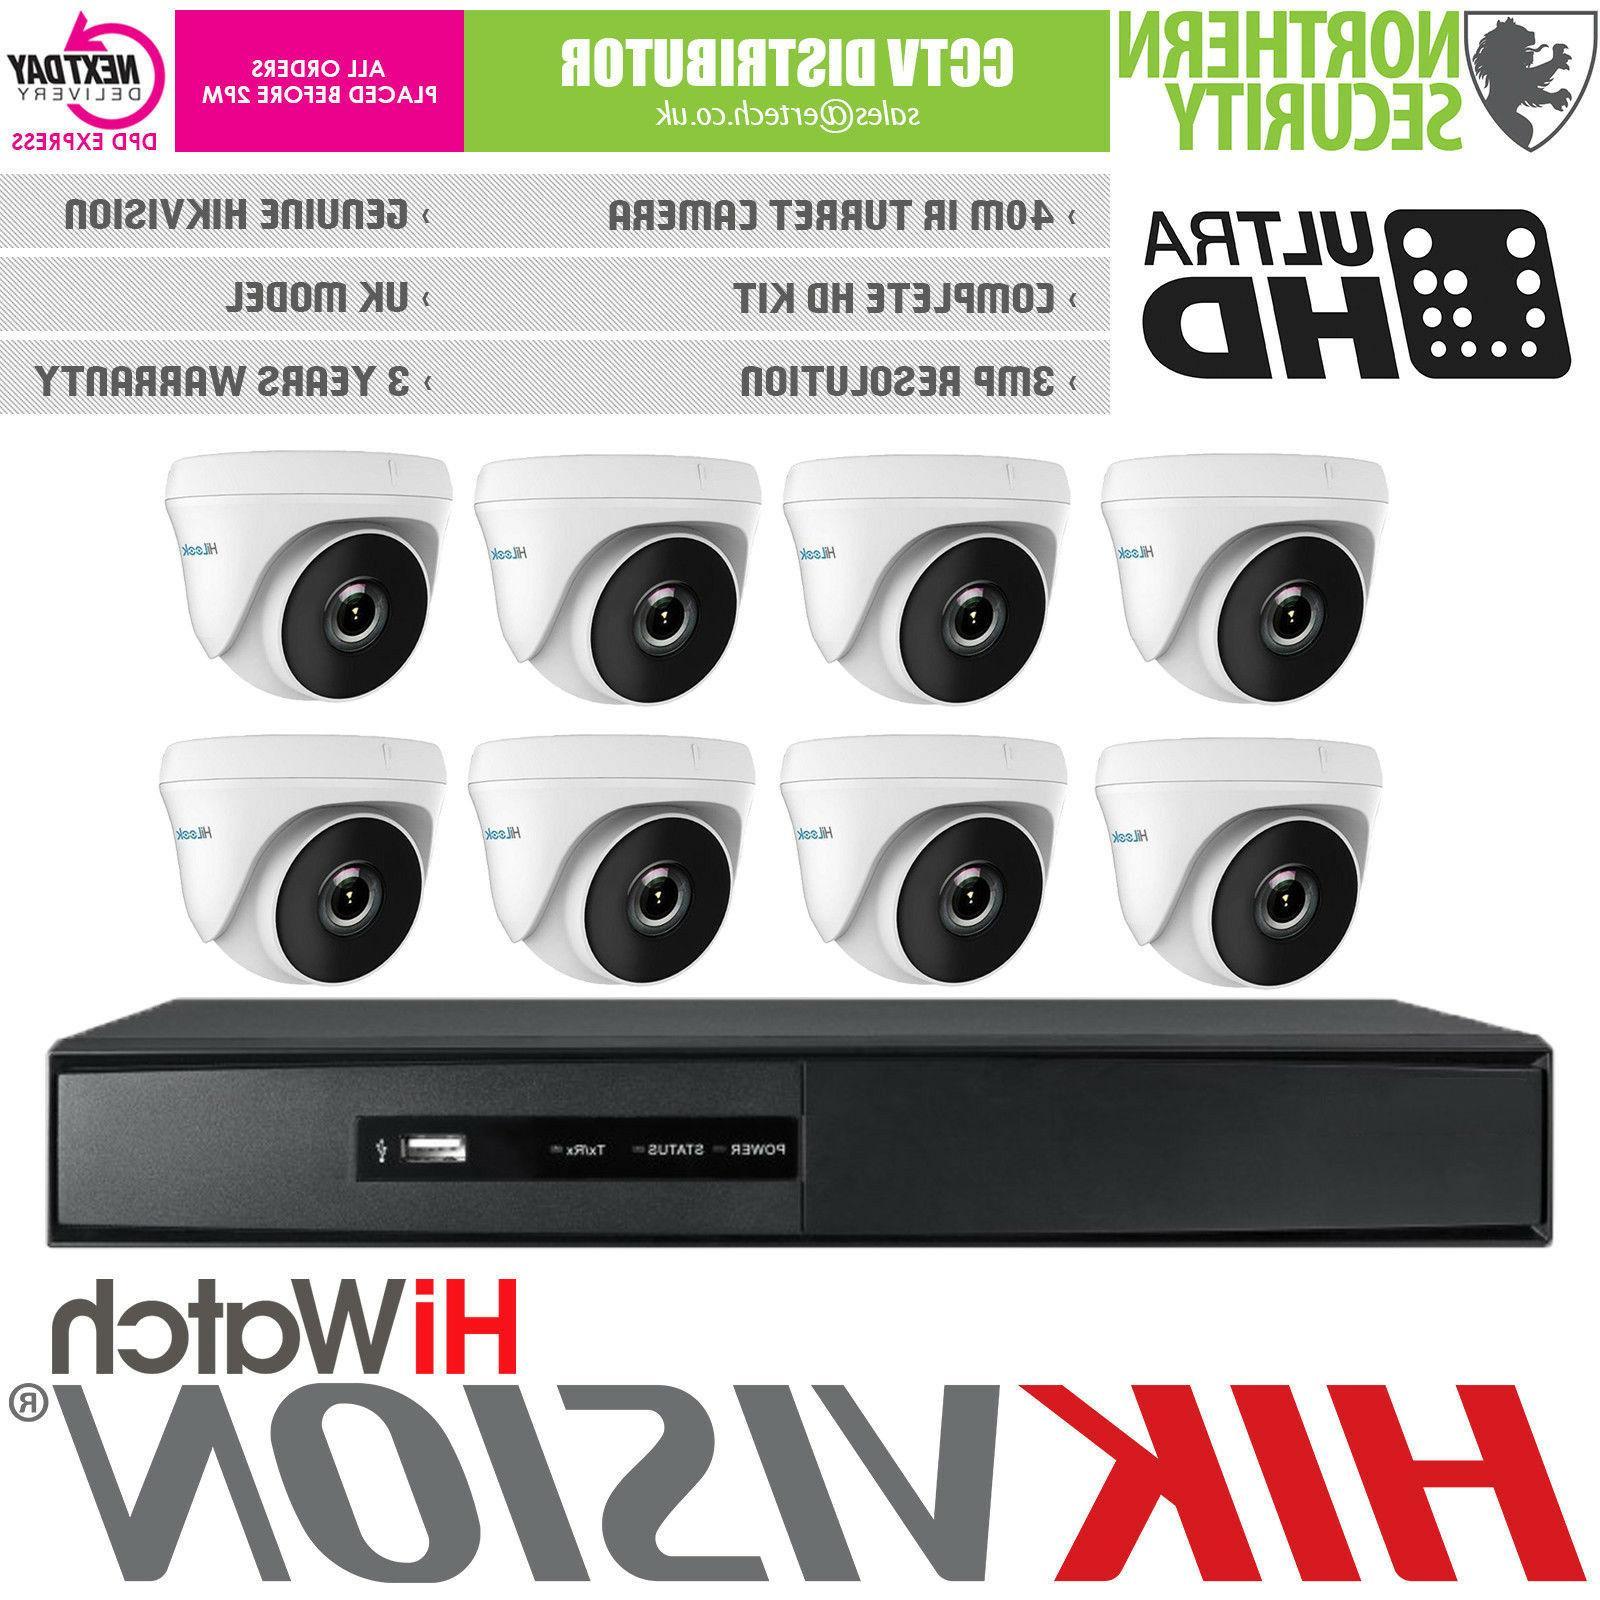 Hikvision 2 4 6 8 HD 3MP IP67 40M IR Alarm Turbo DVR Home Se